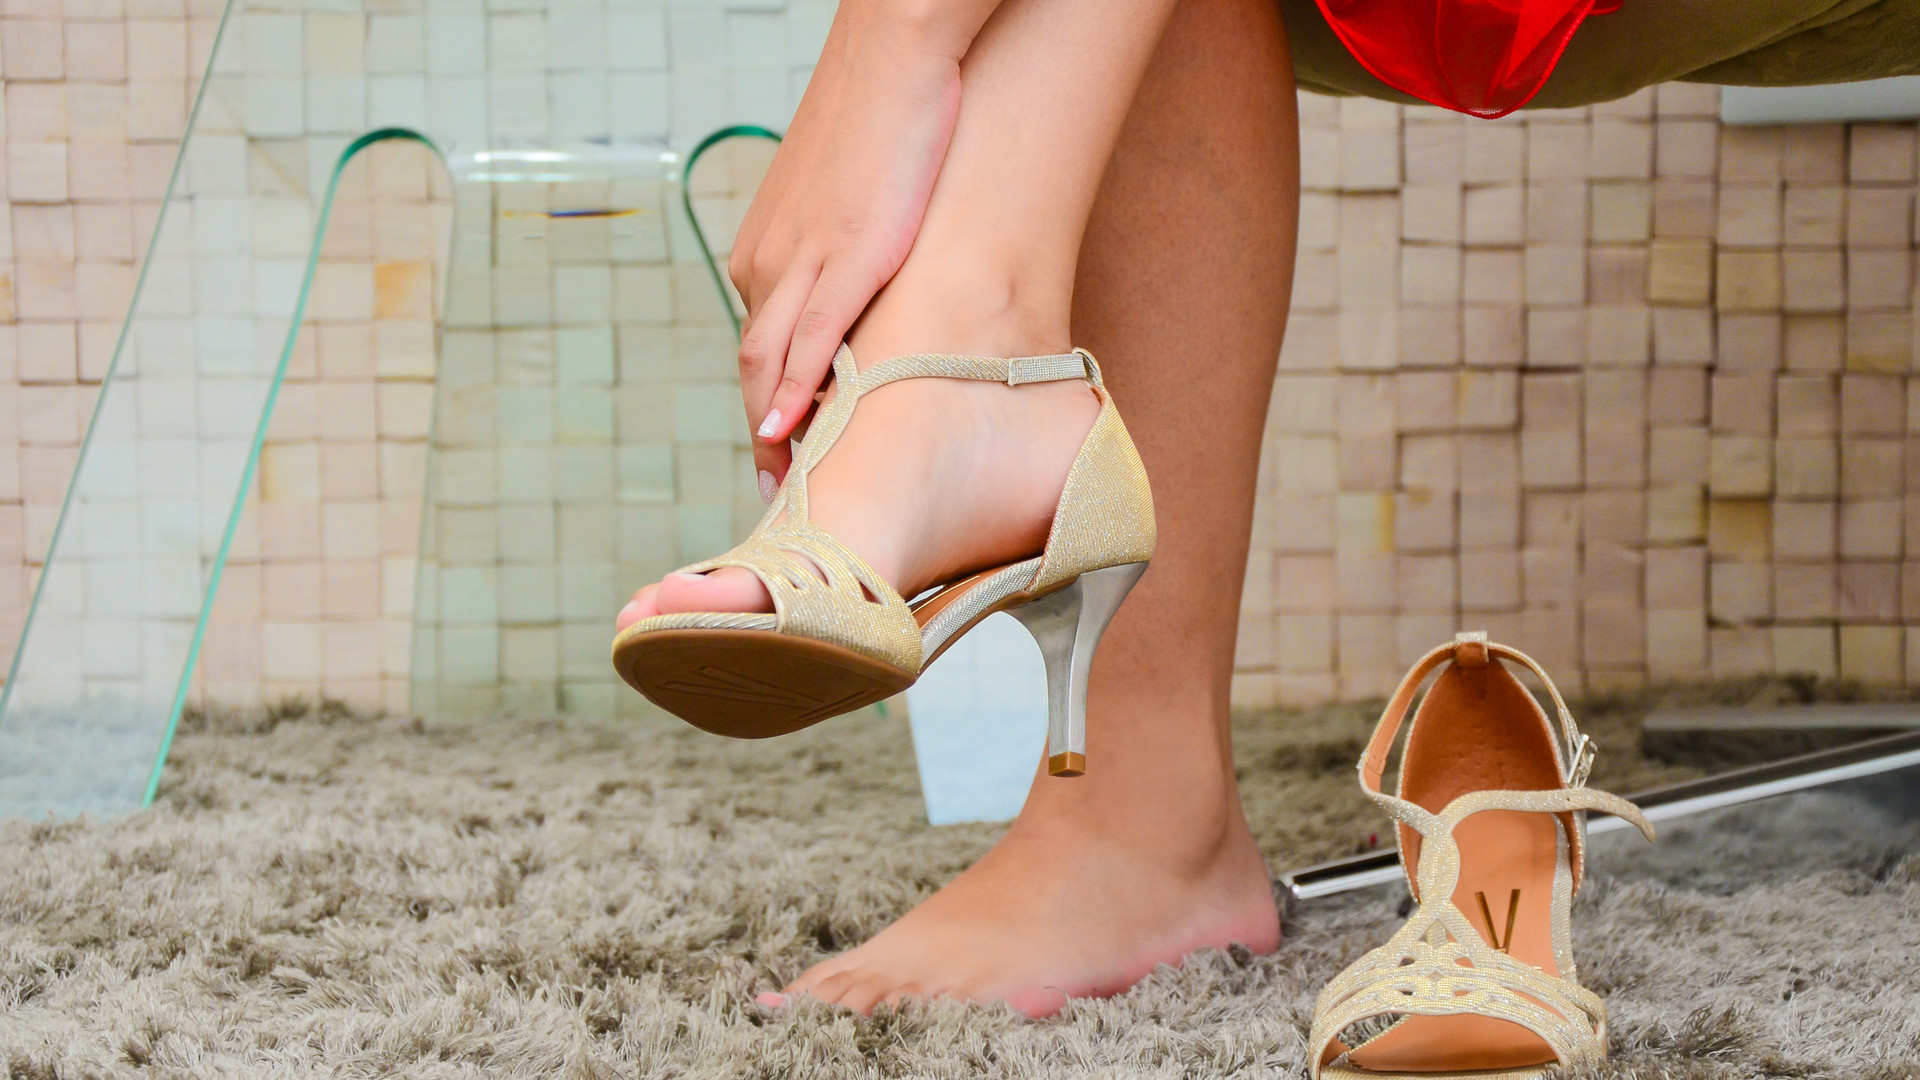 debutante colocando sapato